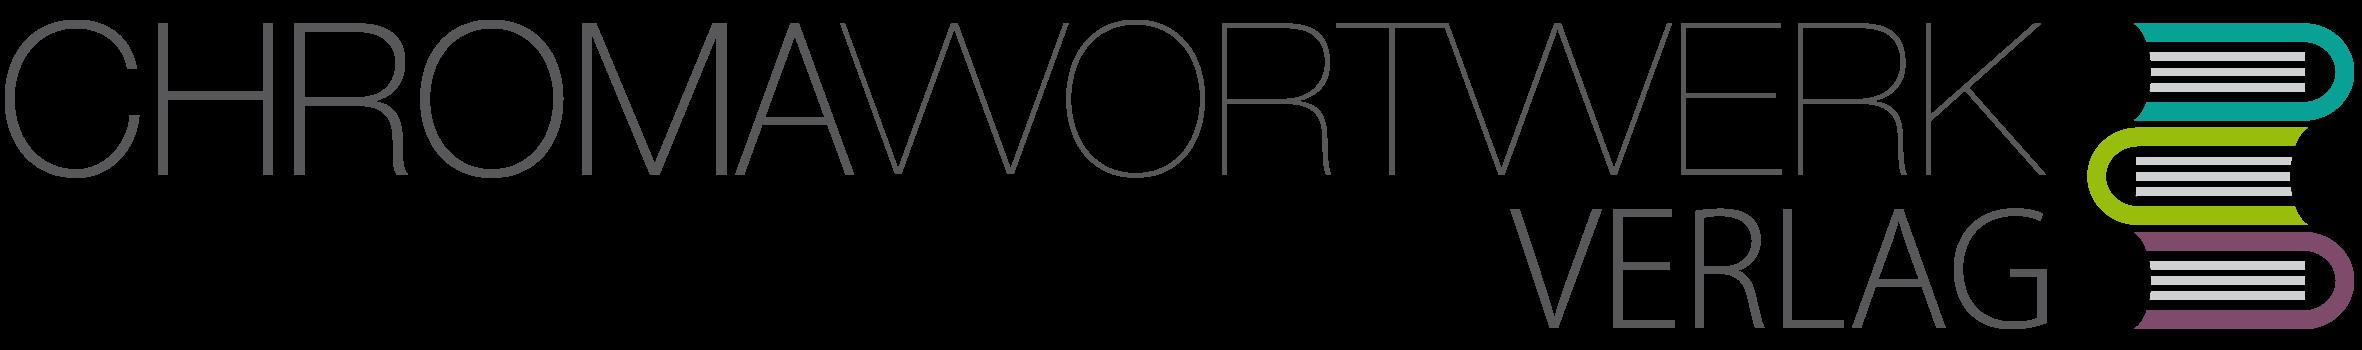 logo_chromawortwerk_rz_rgb